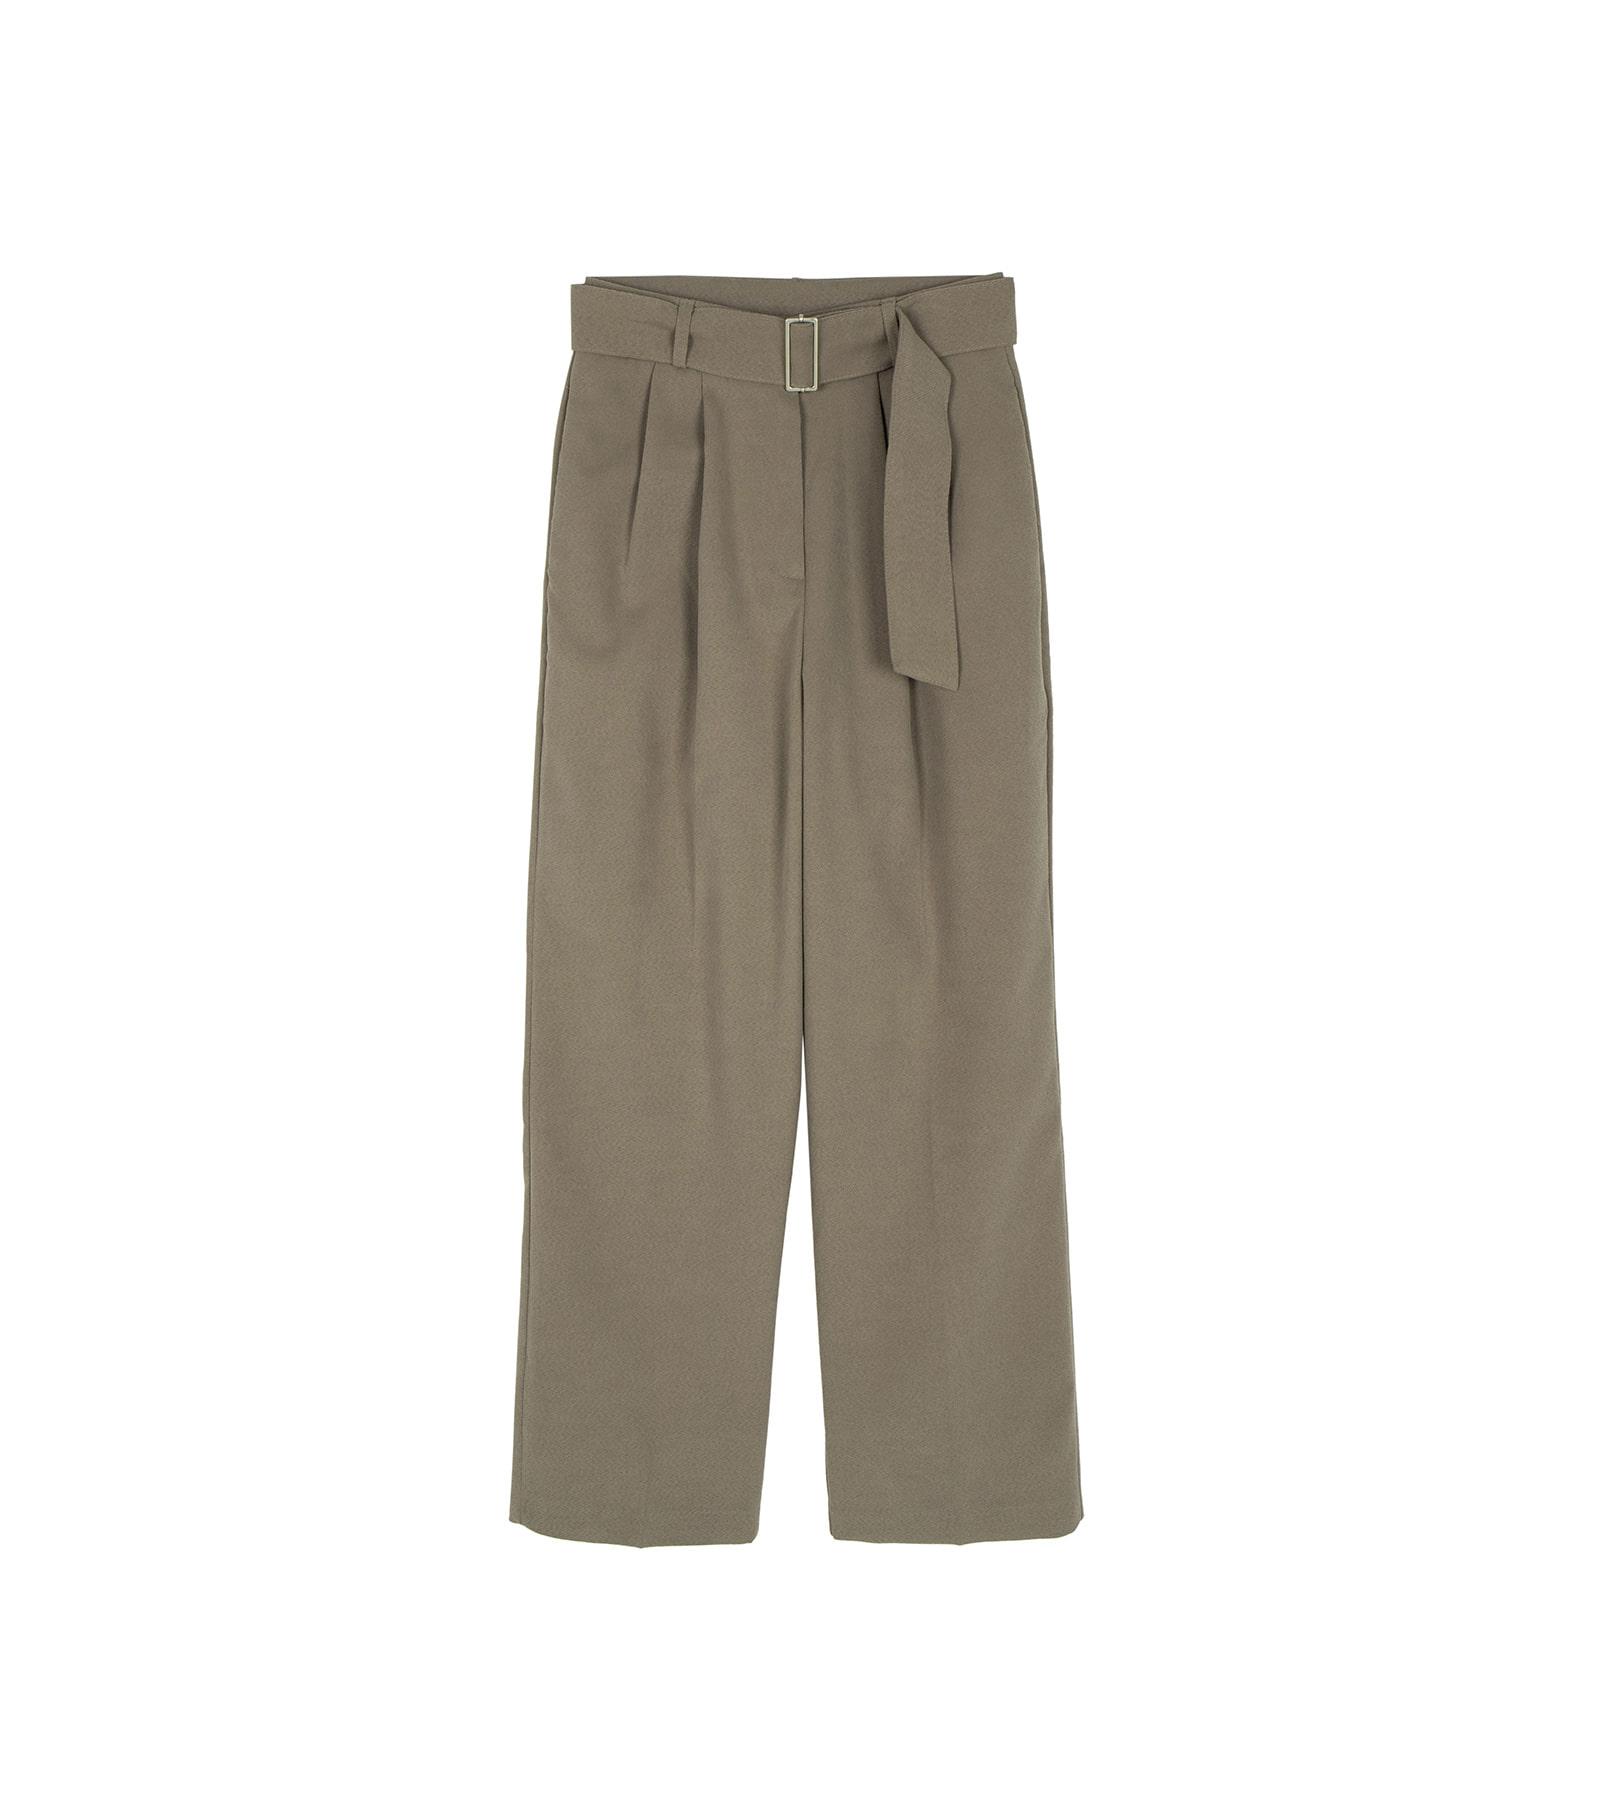 Nib belt slacks